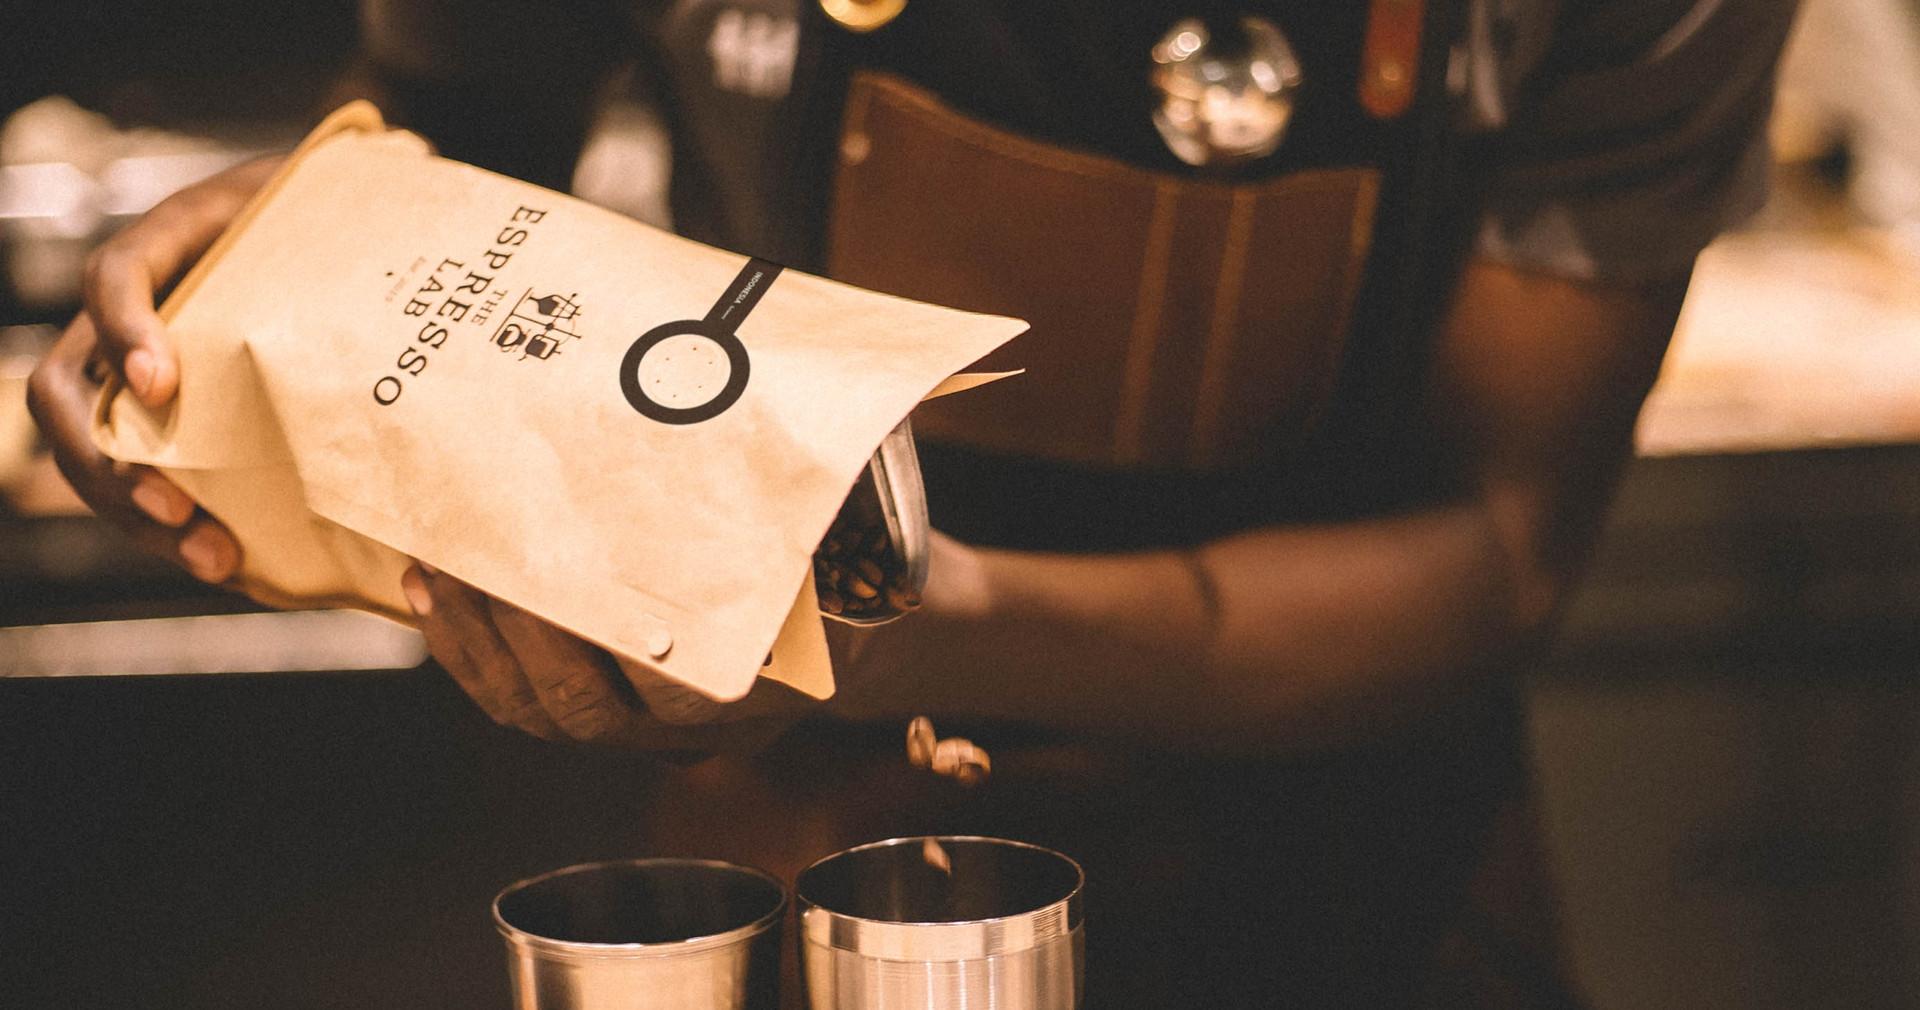 05 TLL Espresso Lab Bag Pouring beans.jp